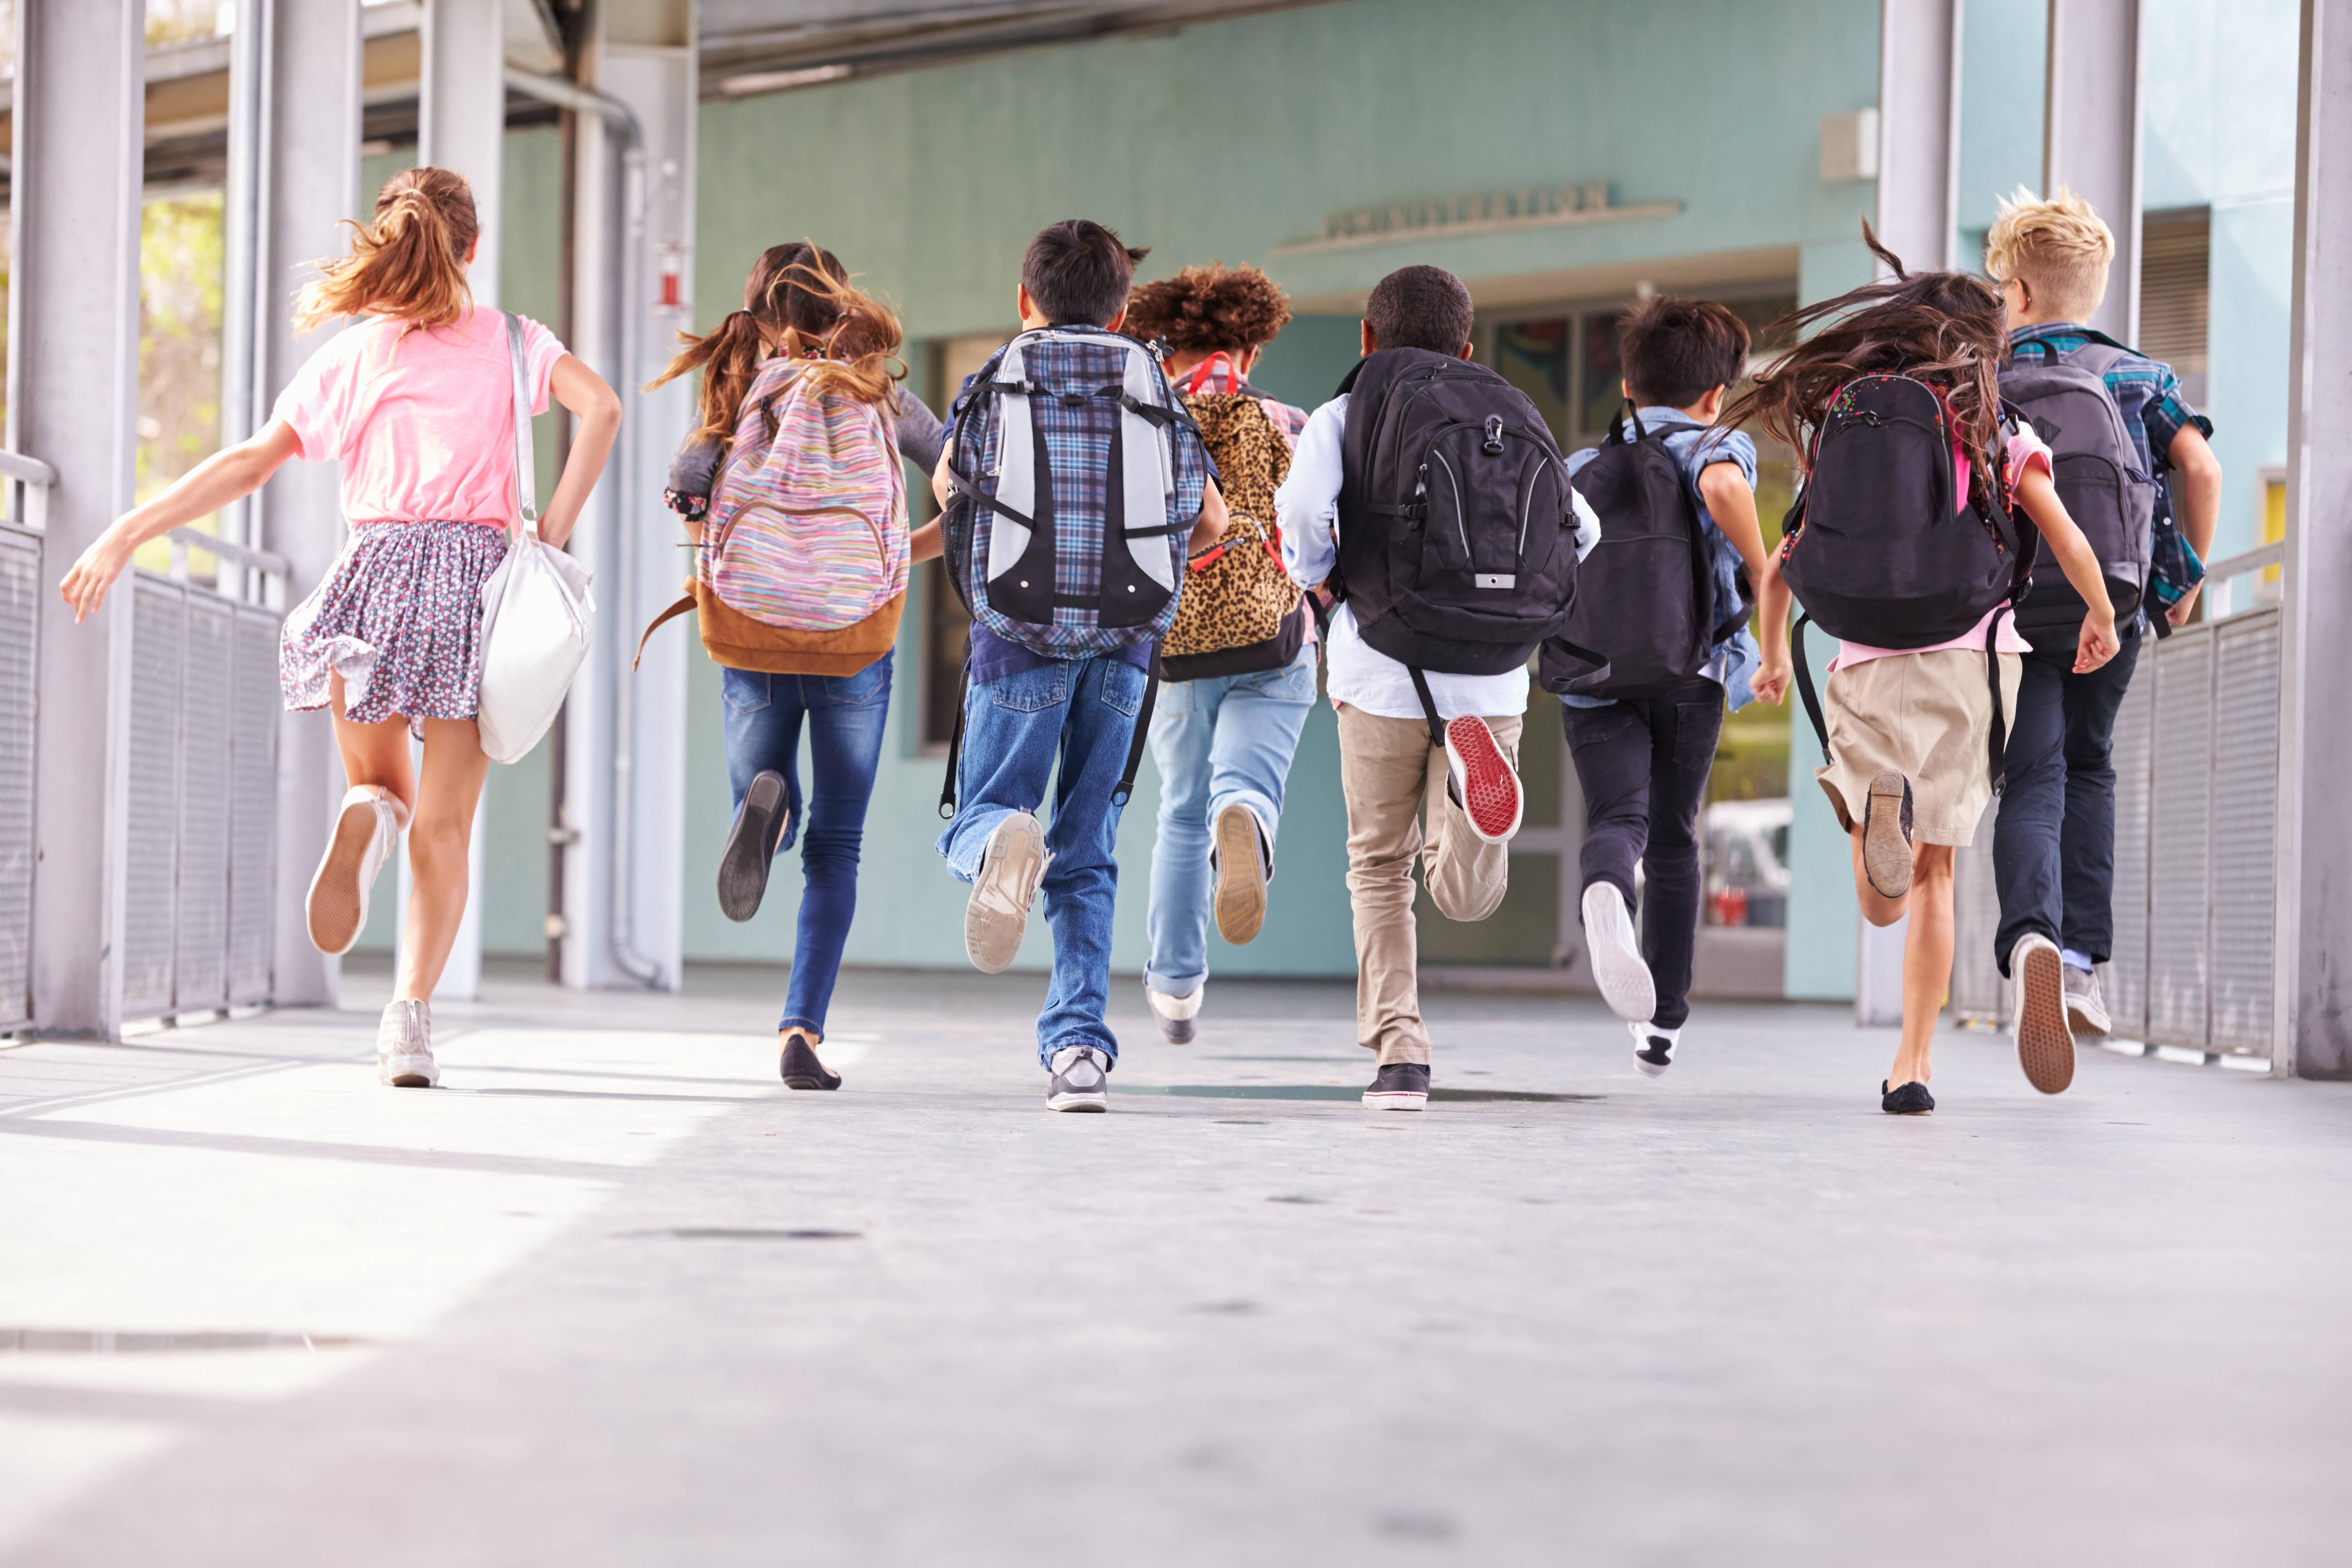 Wanko: Bayonne Schools to Focus on Regular Attendance in 2018-19 School Year